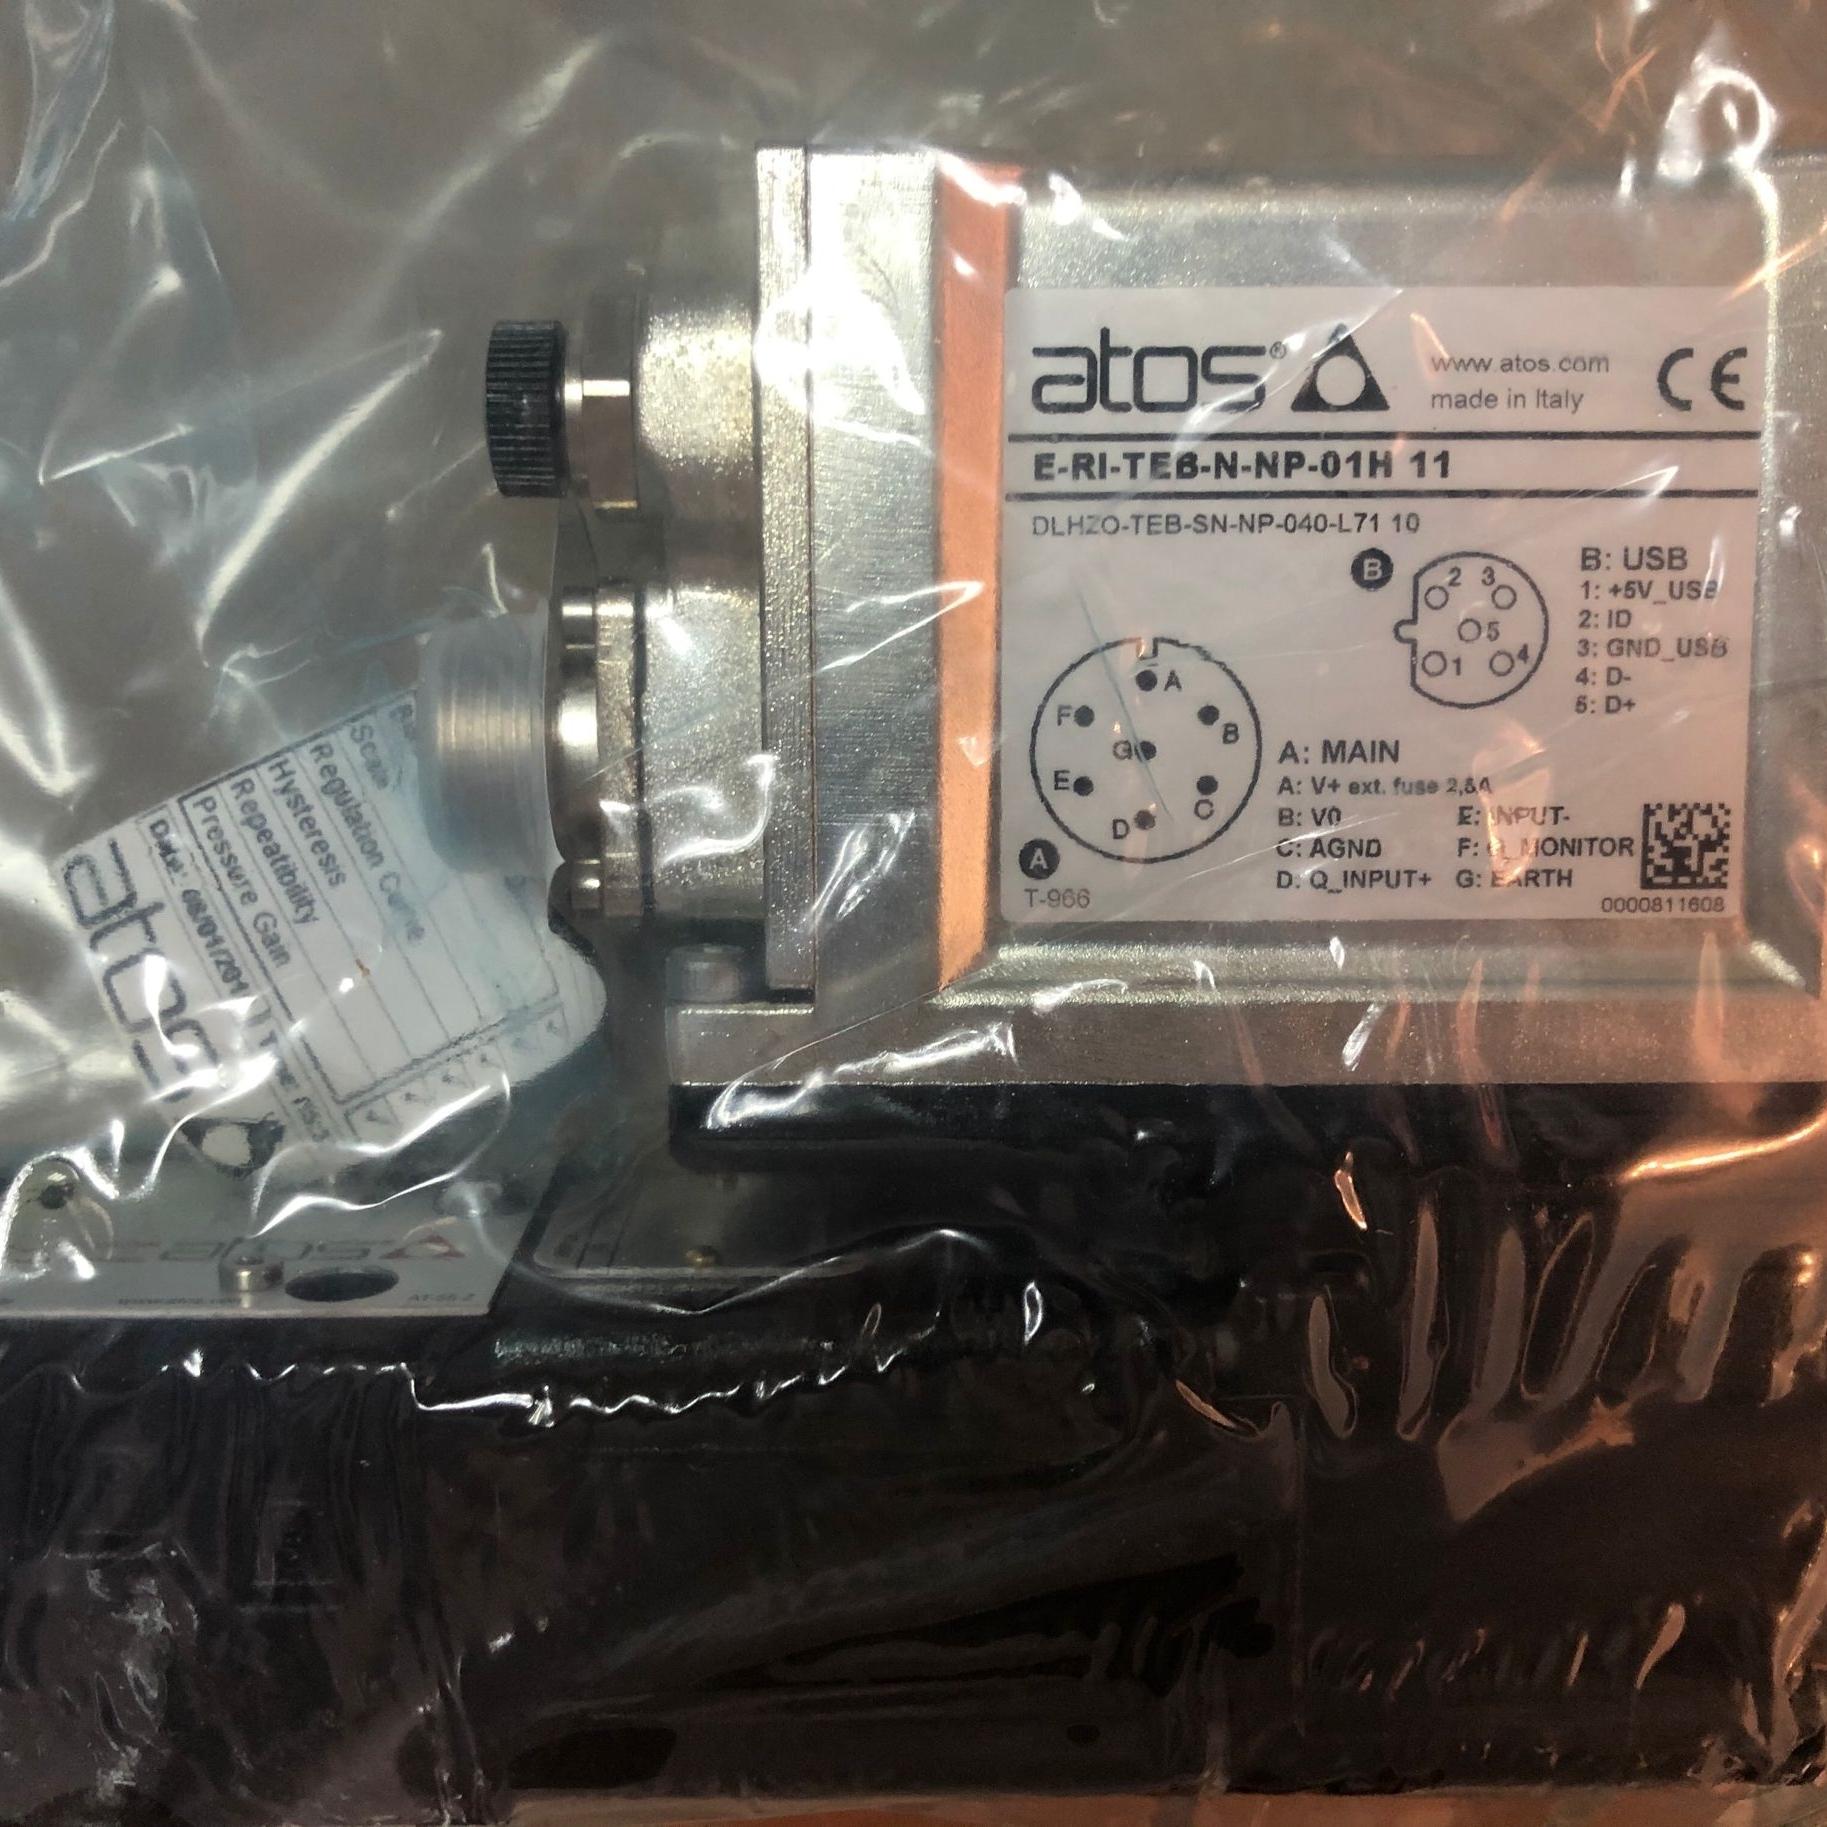 atos电磁阀DKZOR-AEB-NP-171-S5-10特价